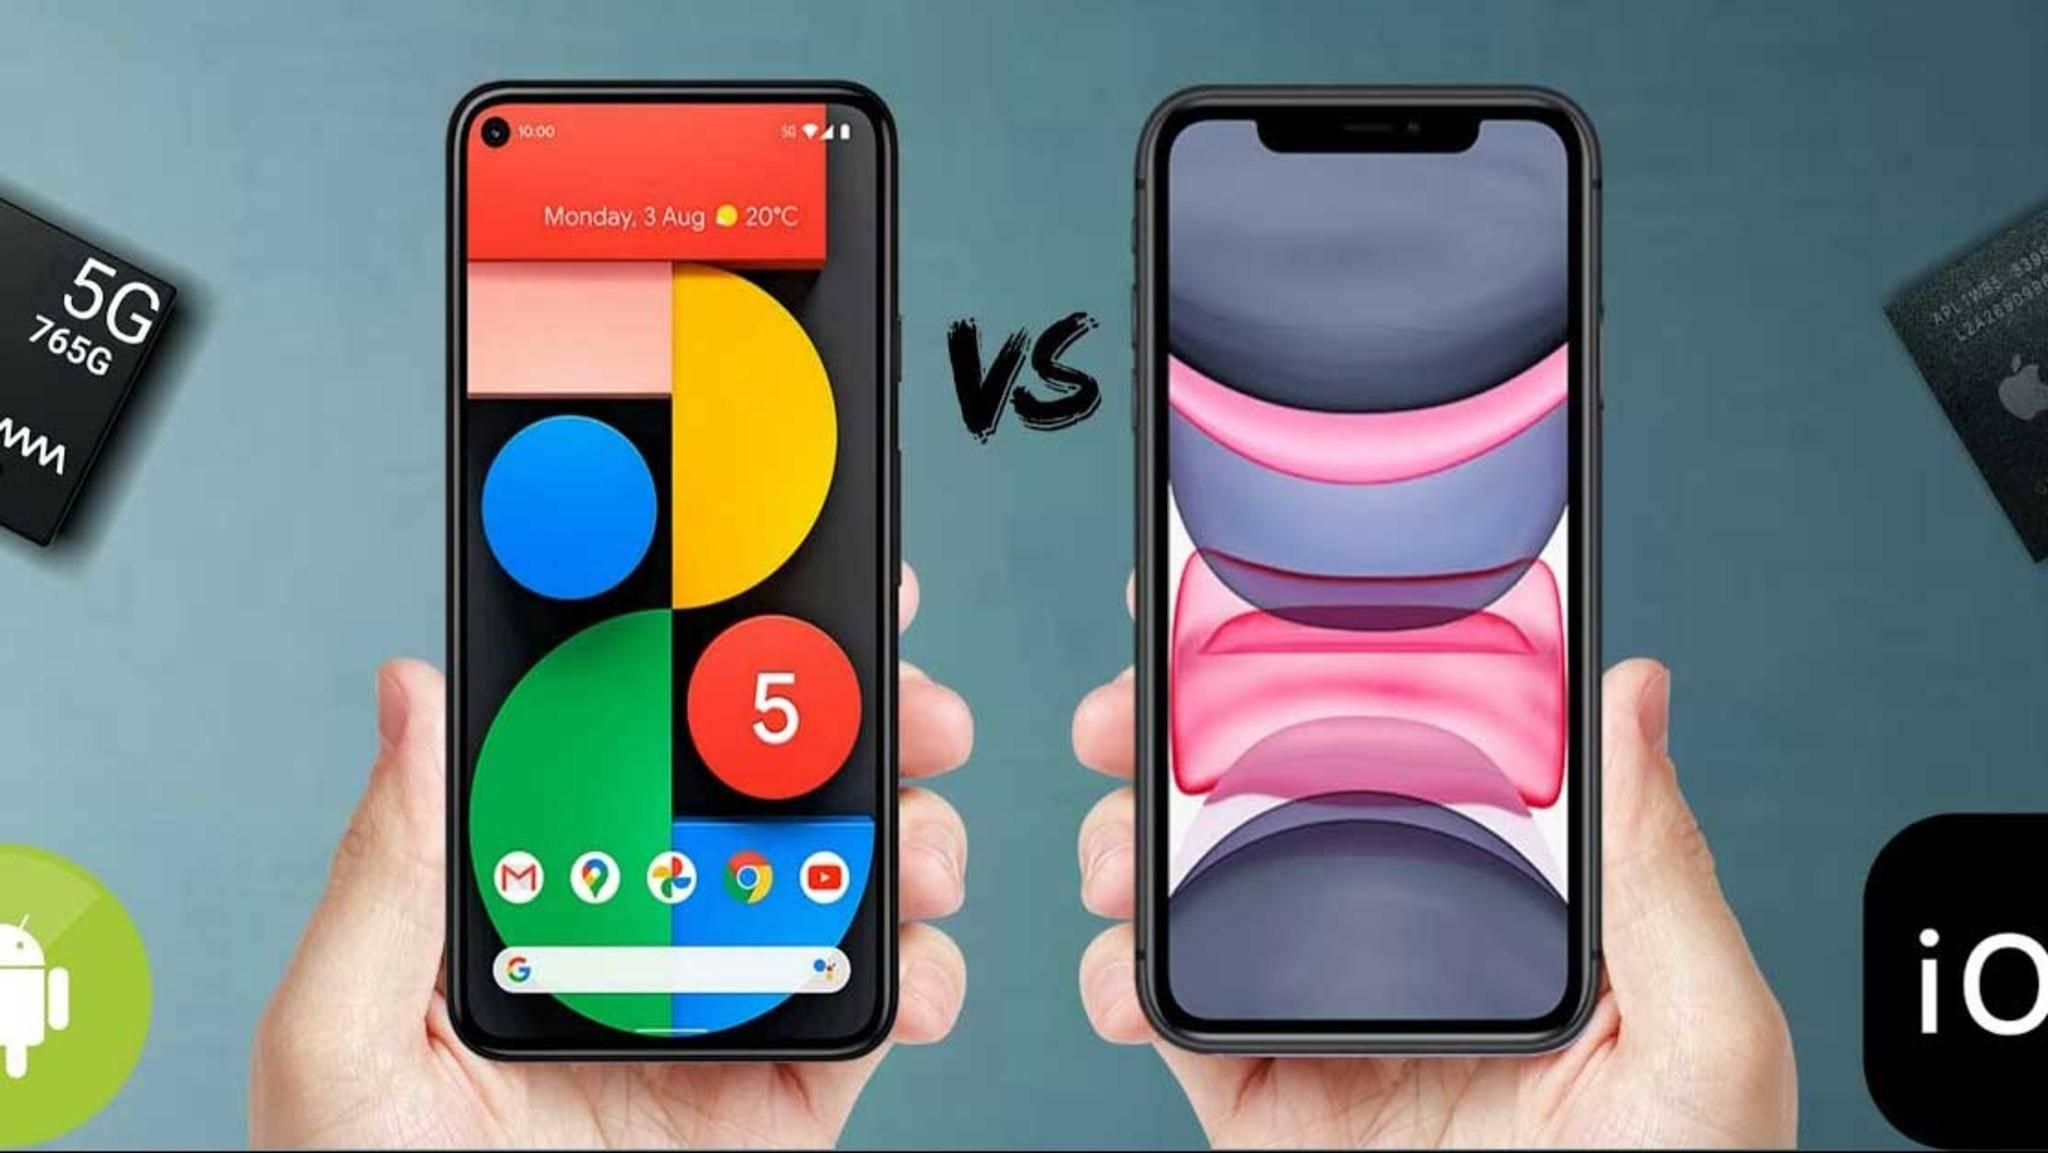 pixel-5-vs-iphone-11